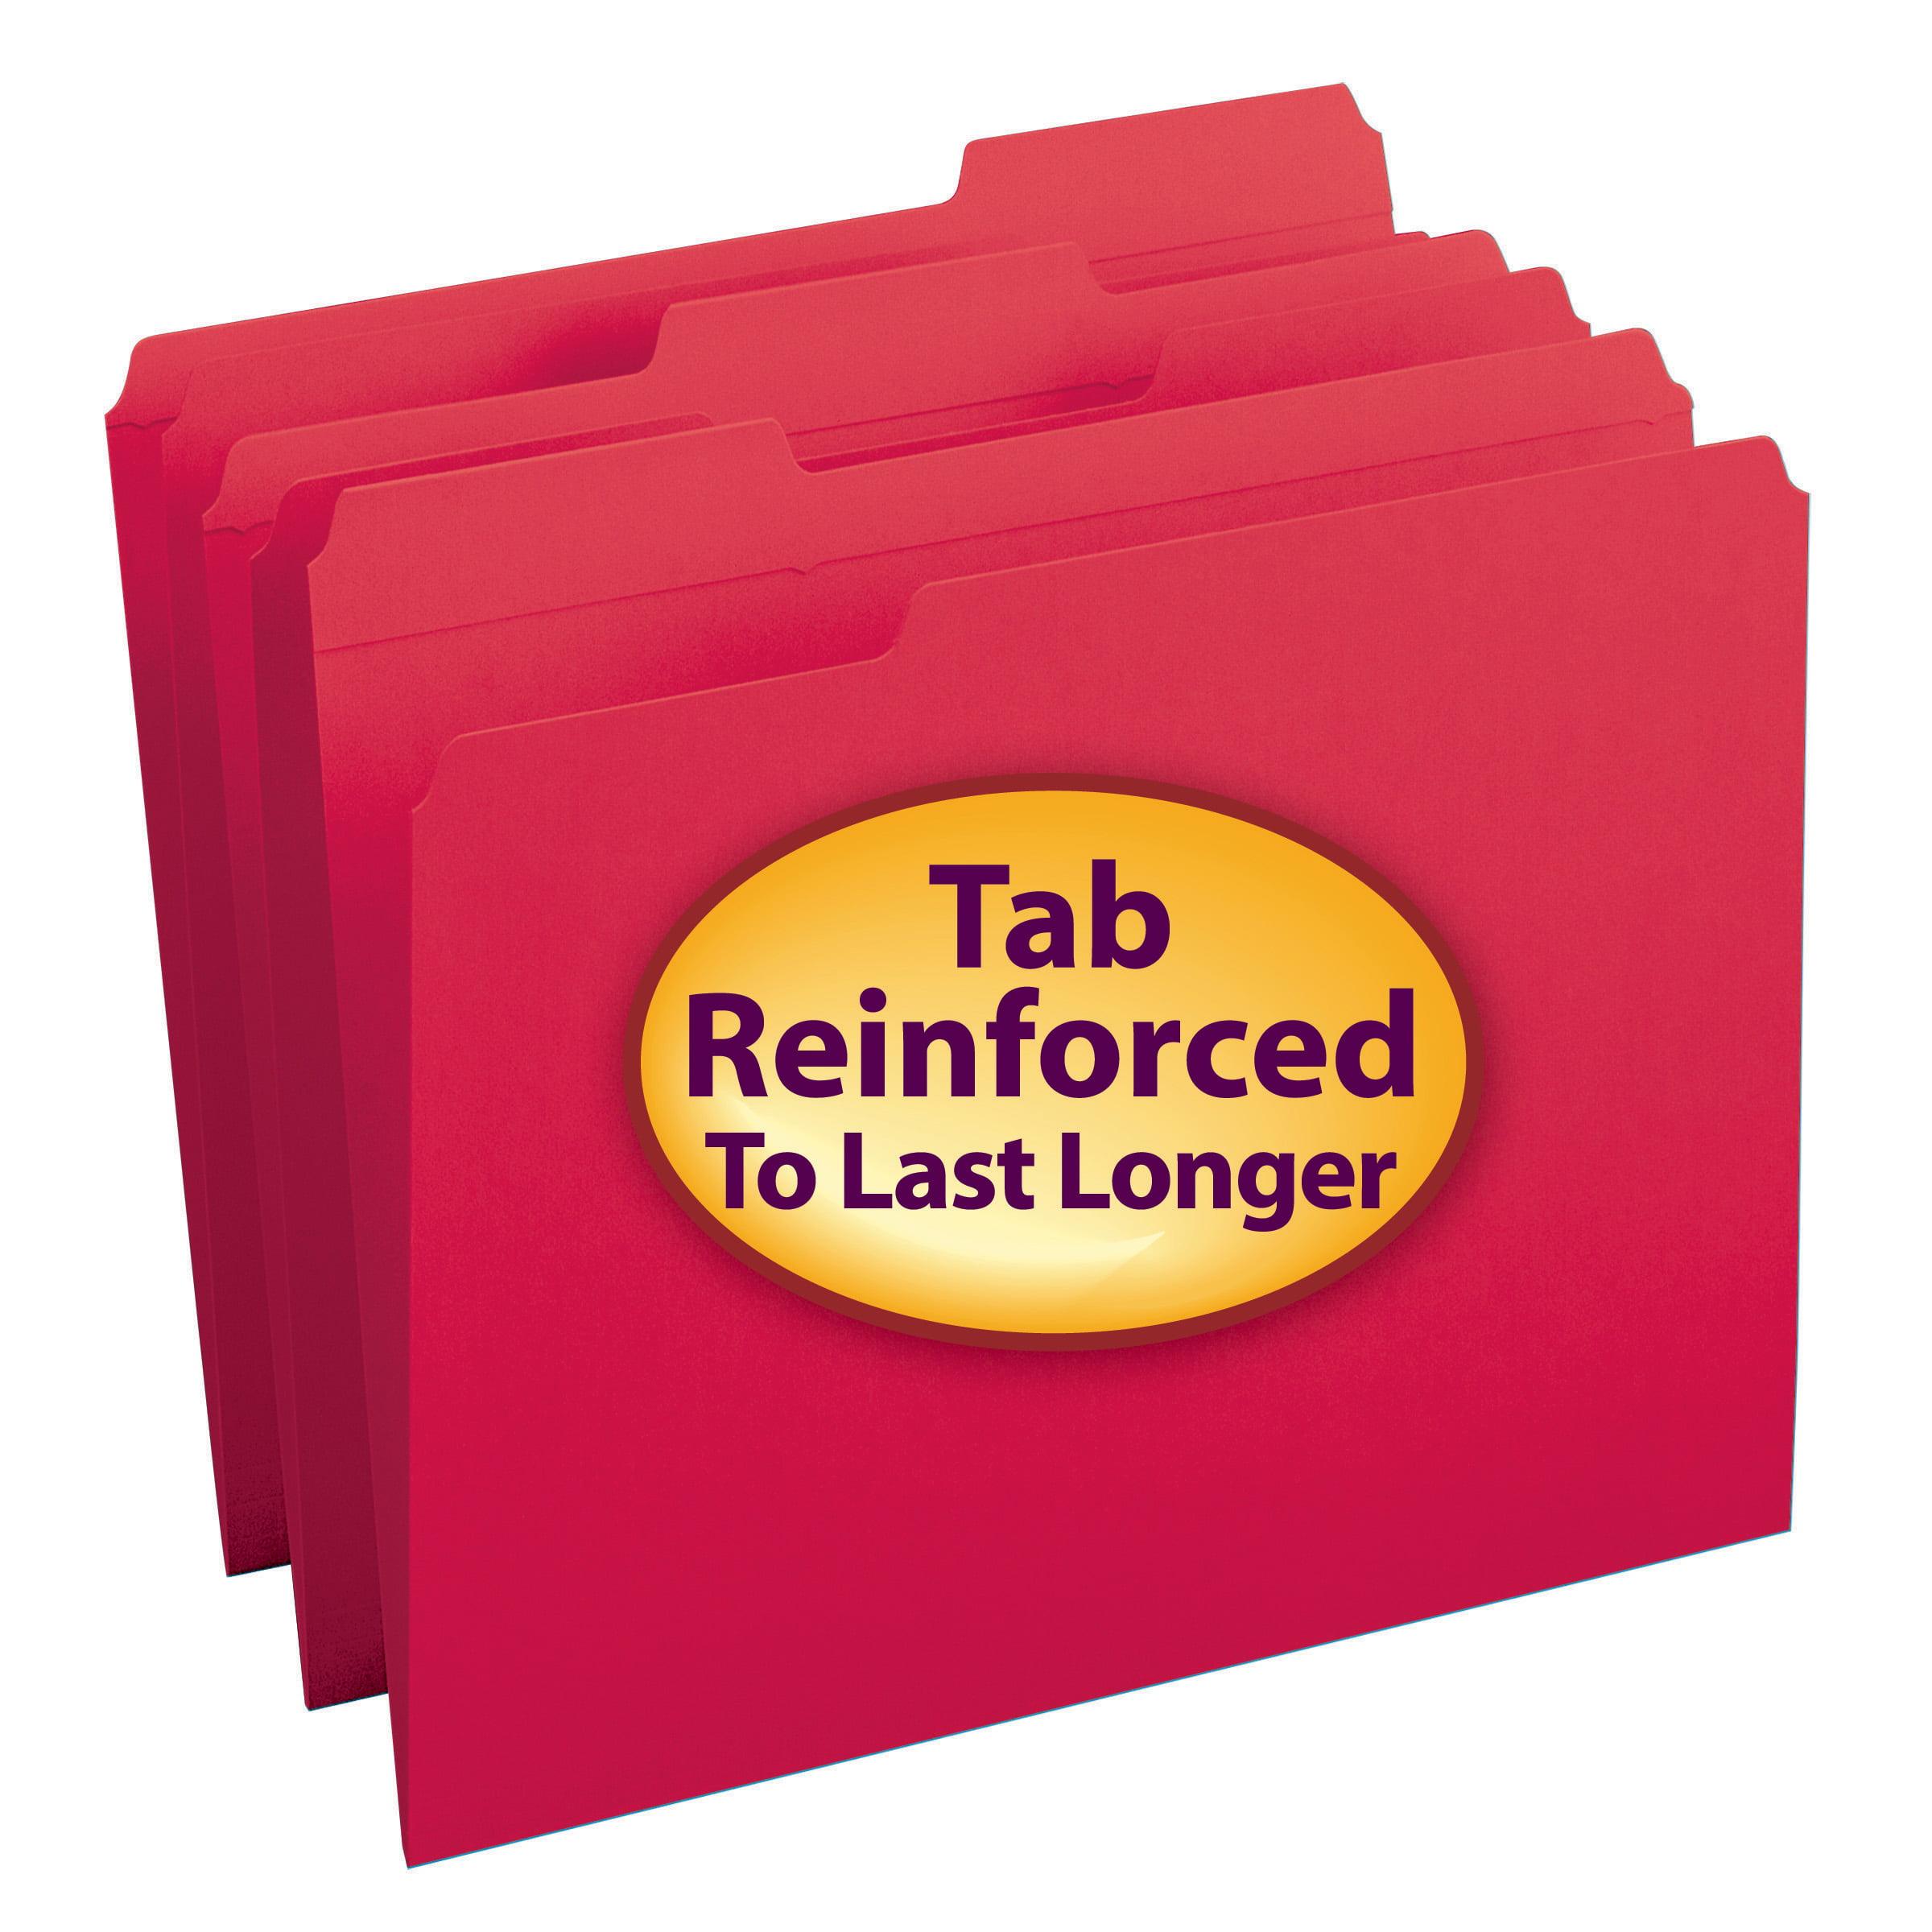 Smead File Folder, Reinforced 1/3-Cut Tab, Letter Size, Red, 100 per Box (12734)